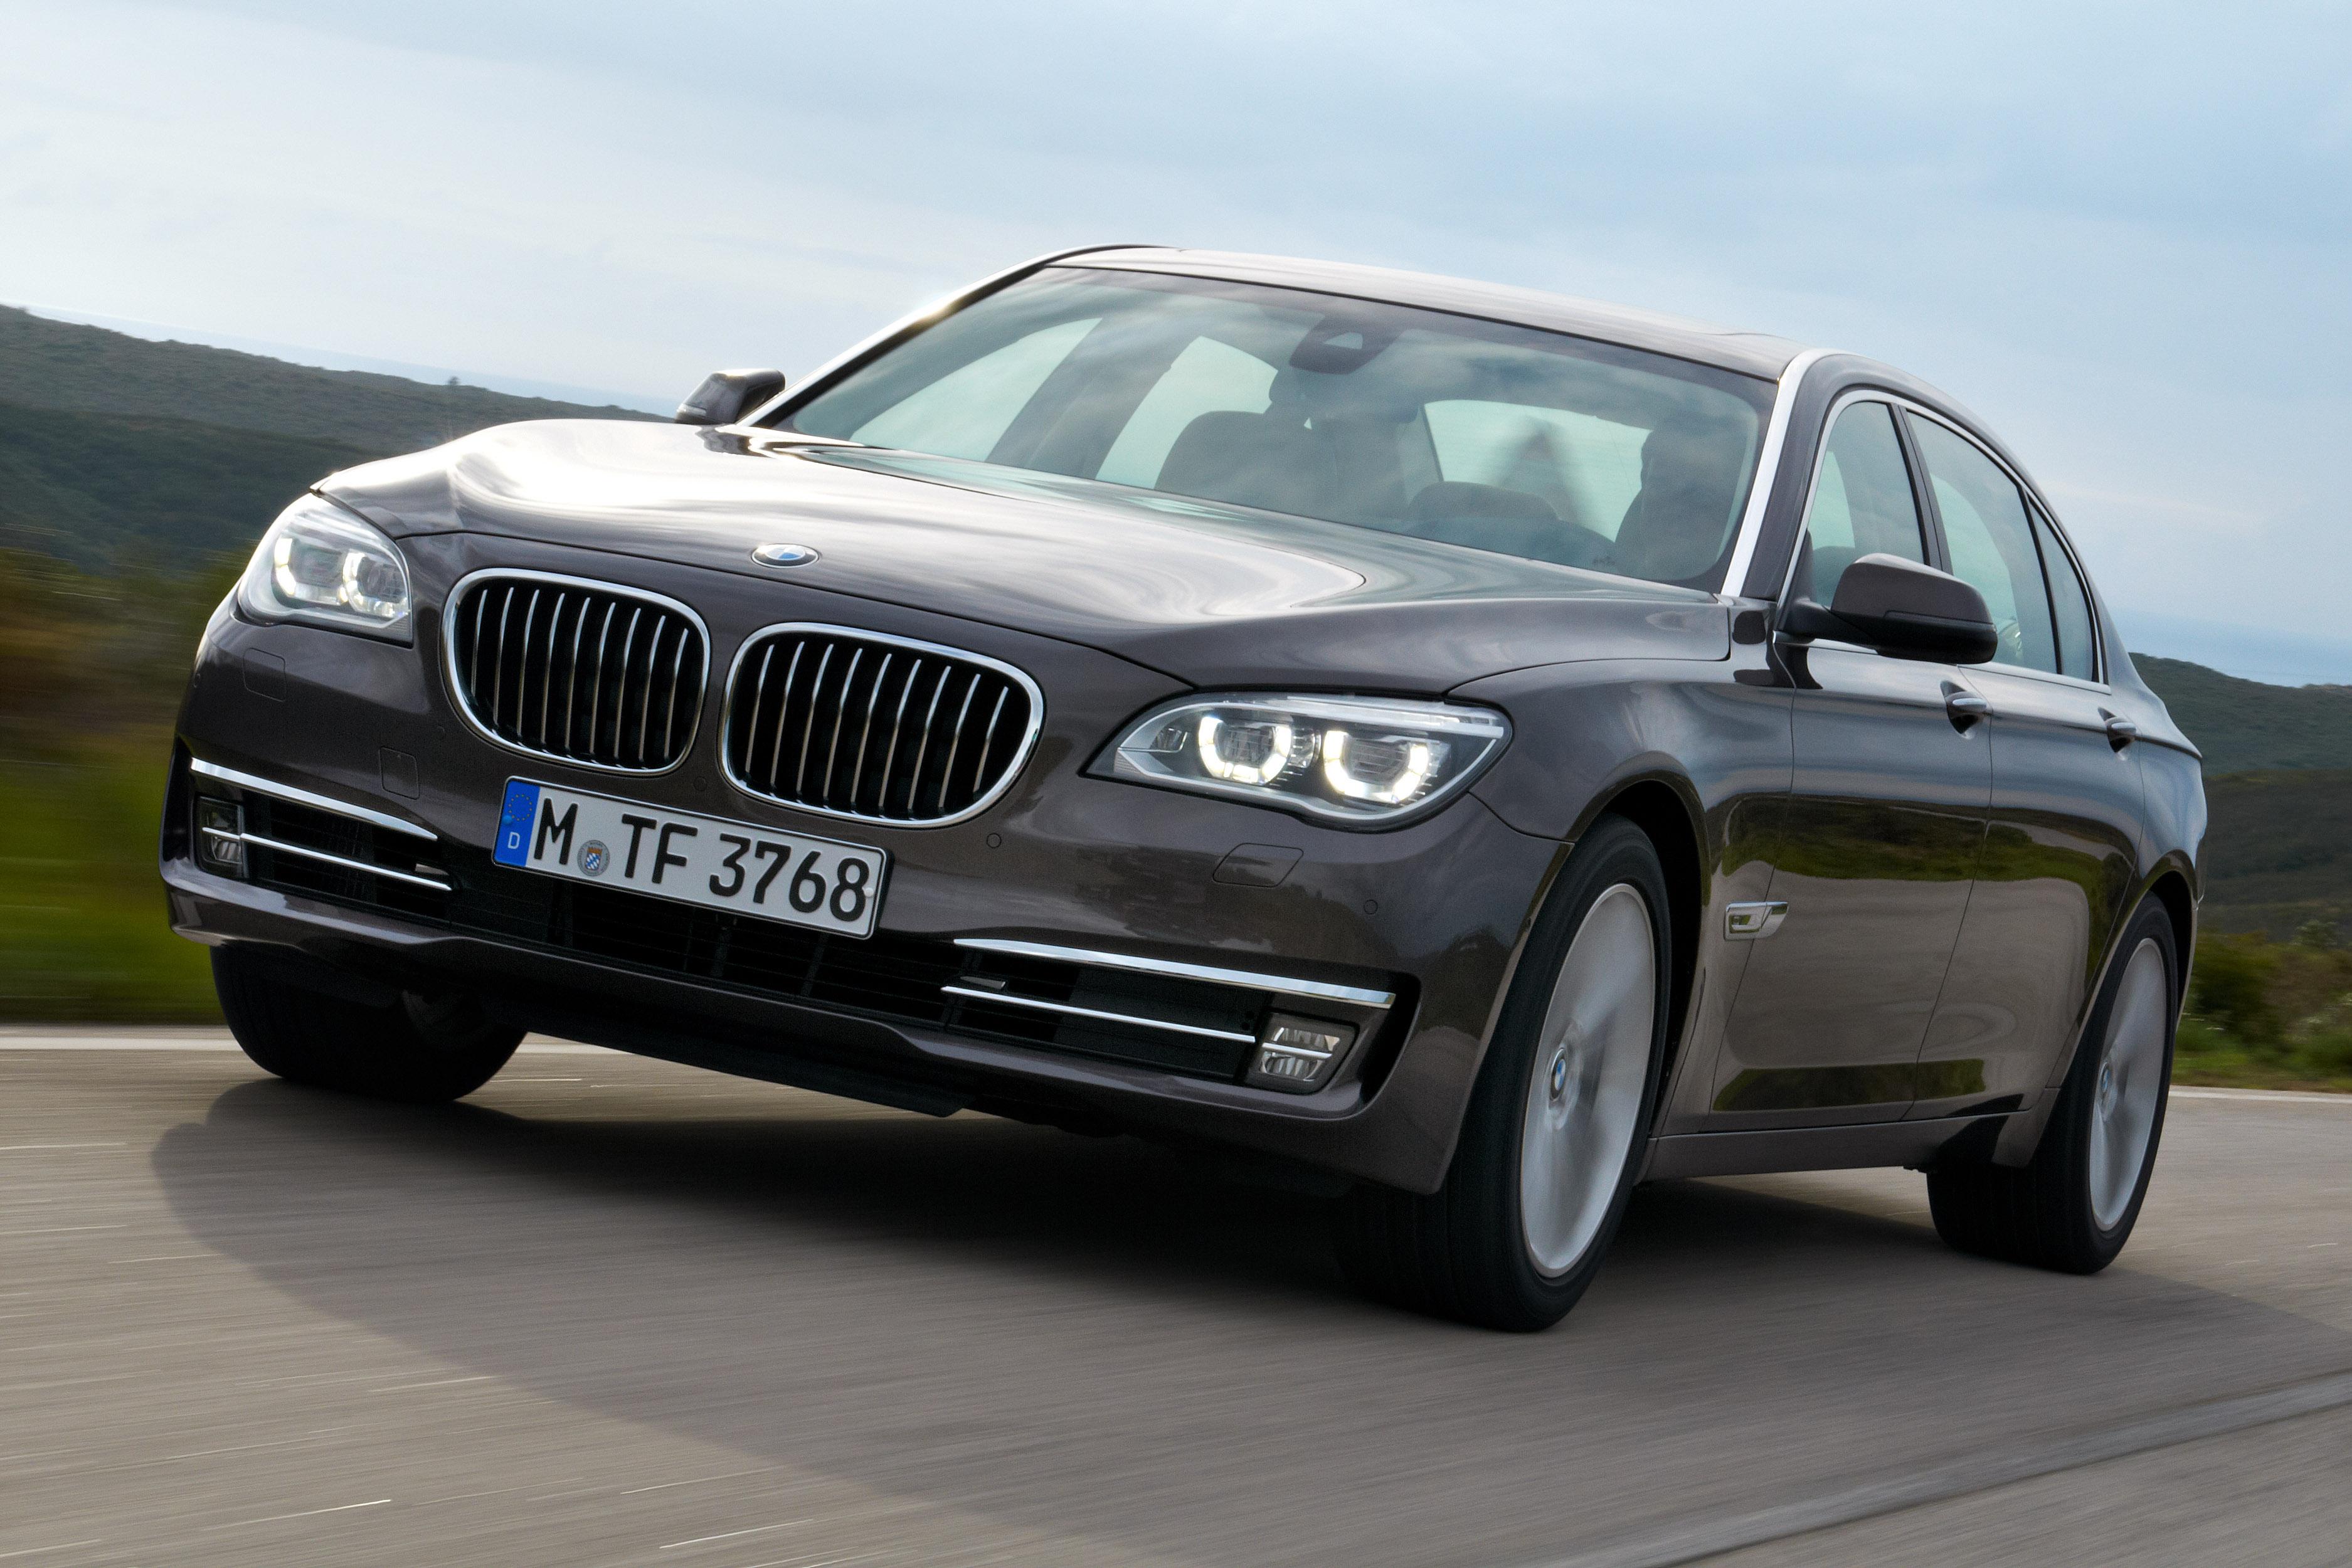 2014 BMW 7 Series Long Wheel Base